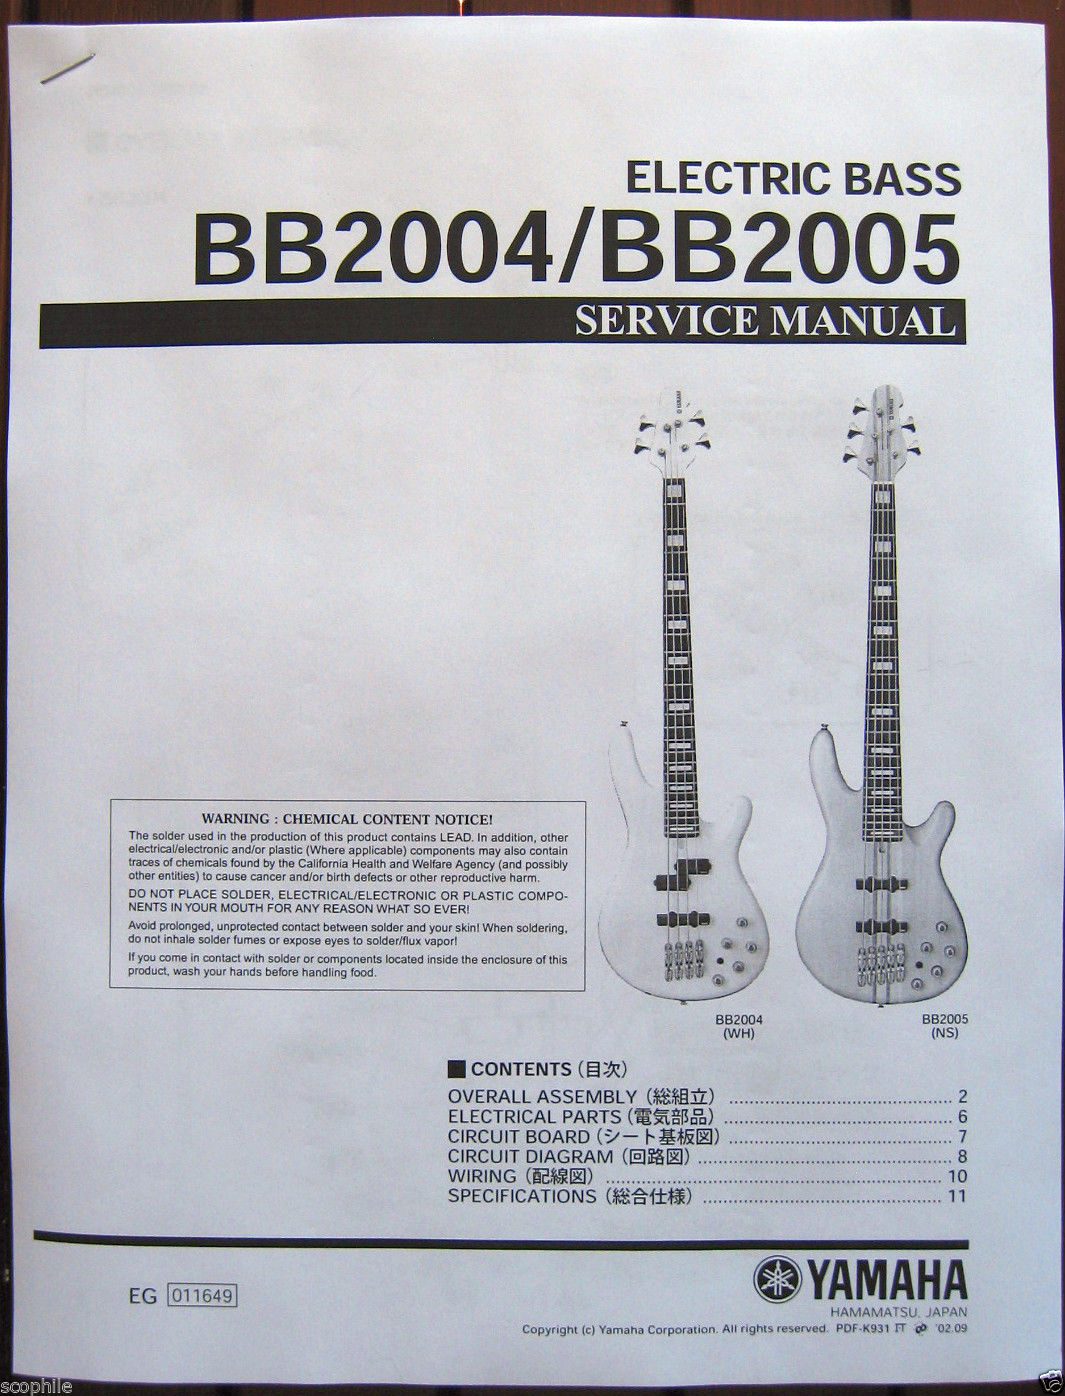 Yamaha Rbx170 Wiring Diagram Free Download Bass Guitar Bb2004 And Bb2005 Service 34 Similar Items At